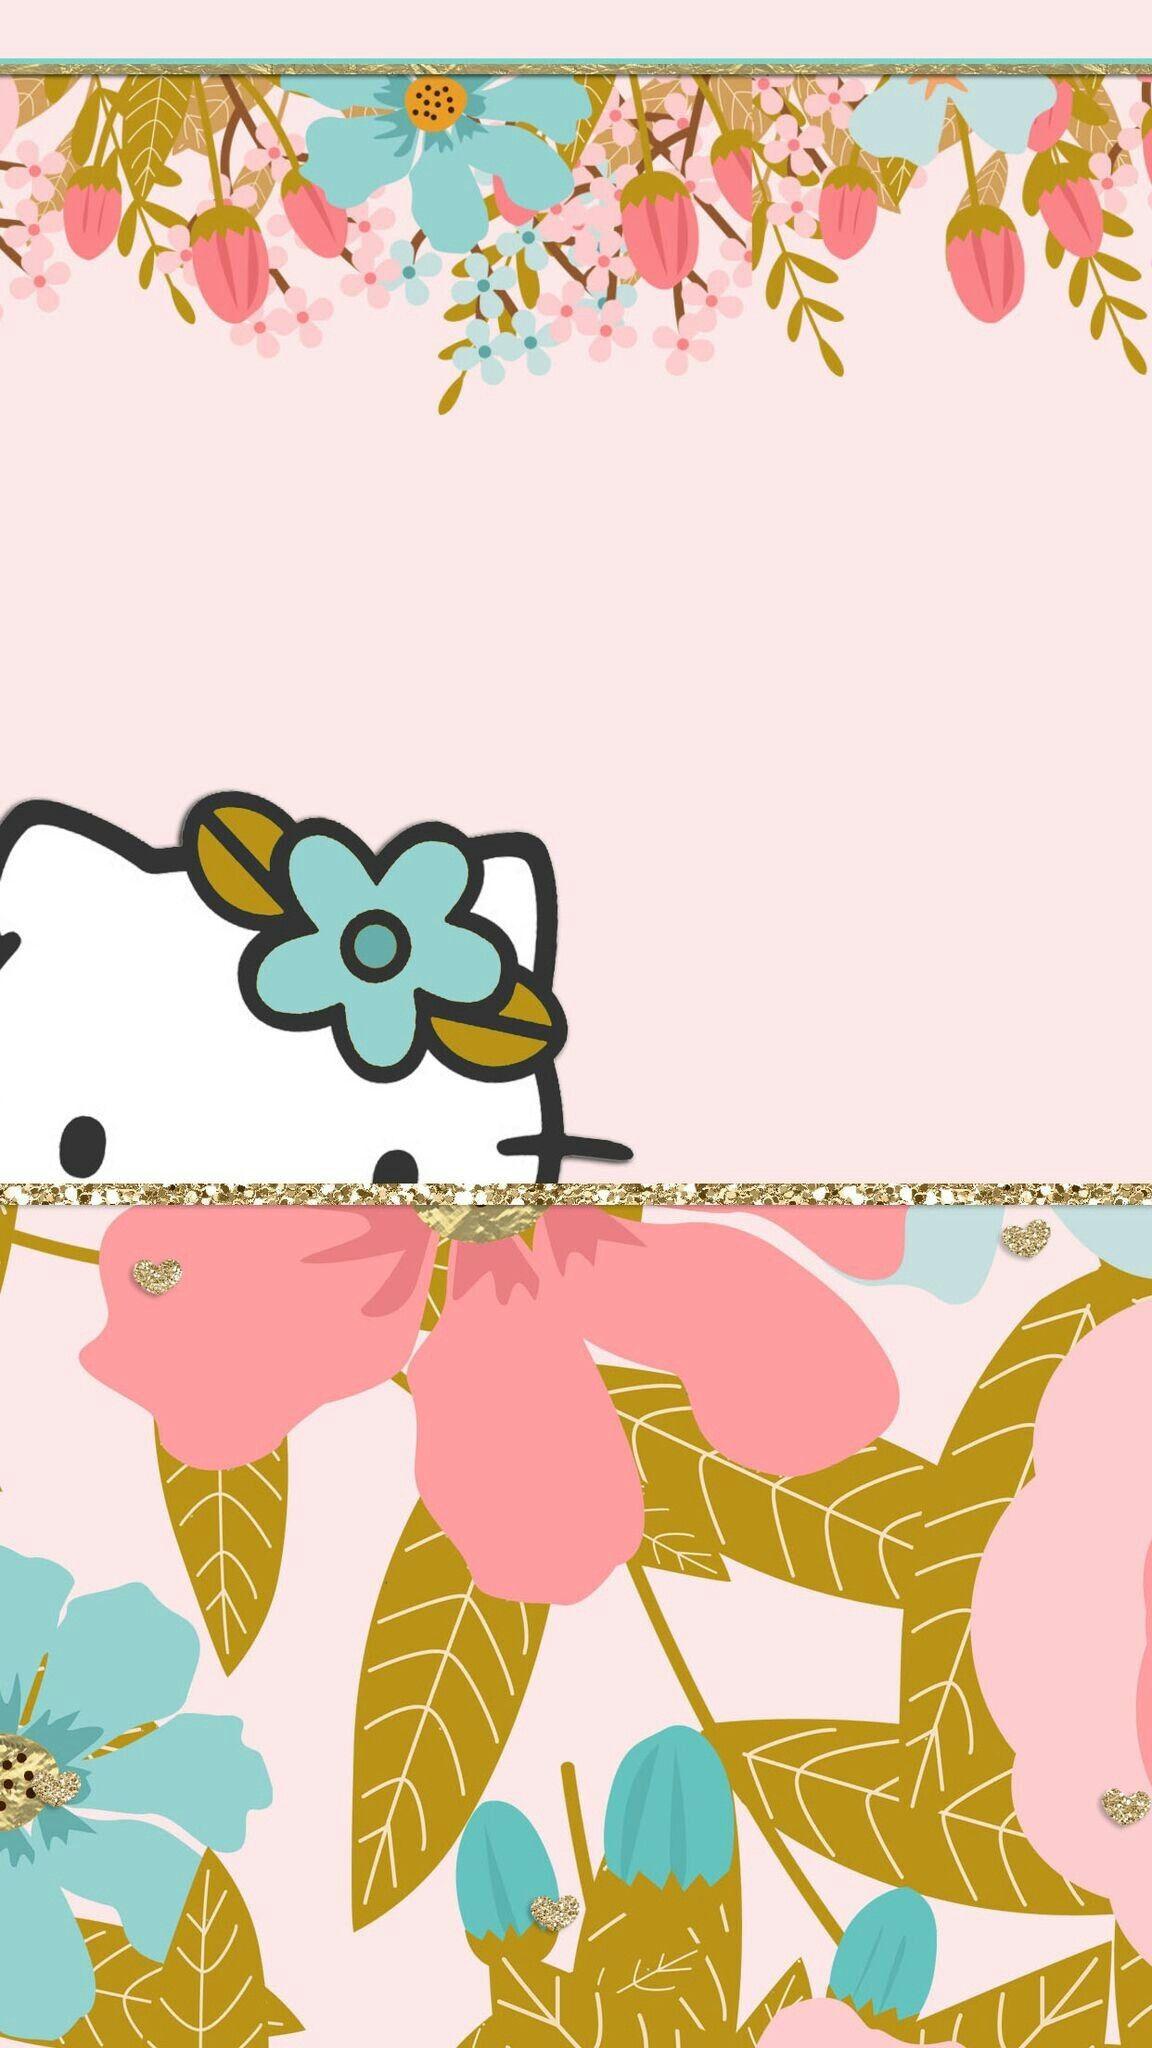 Iphone Wall Tjn Iphone Walls 4 Kitty Wallpaper Hello Kitty